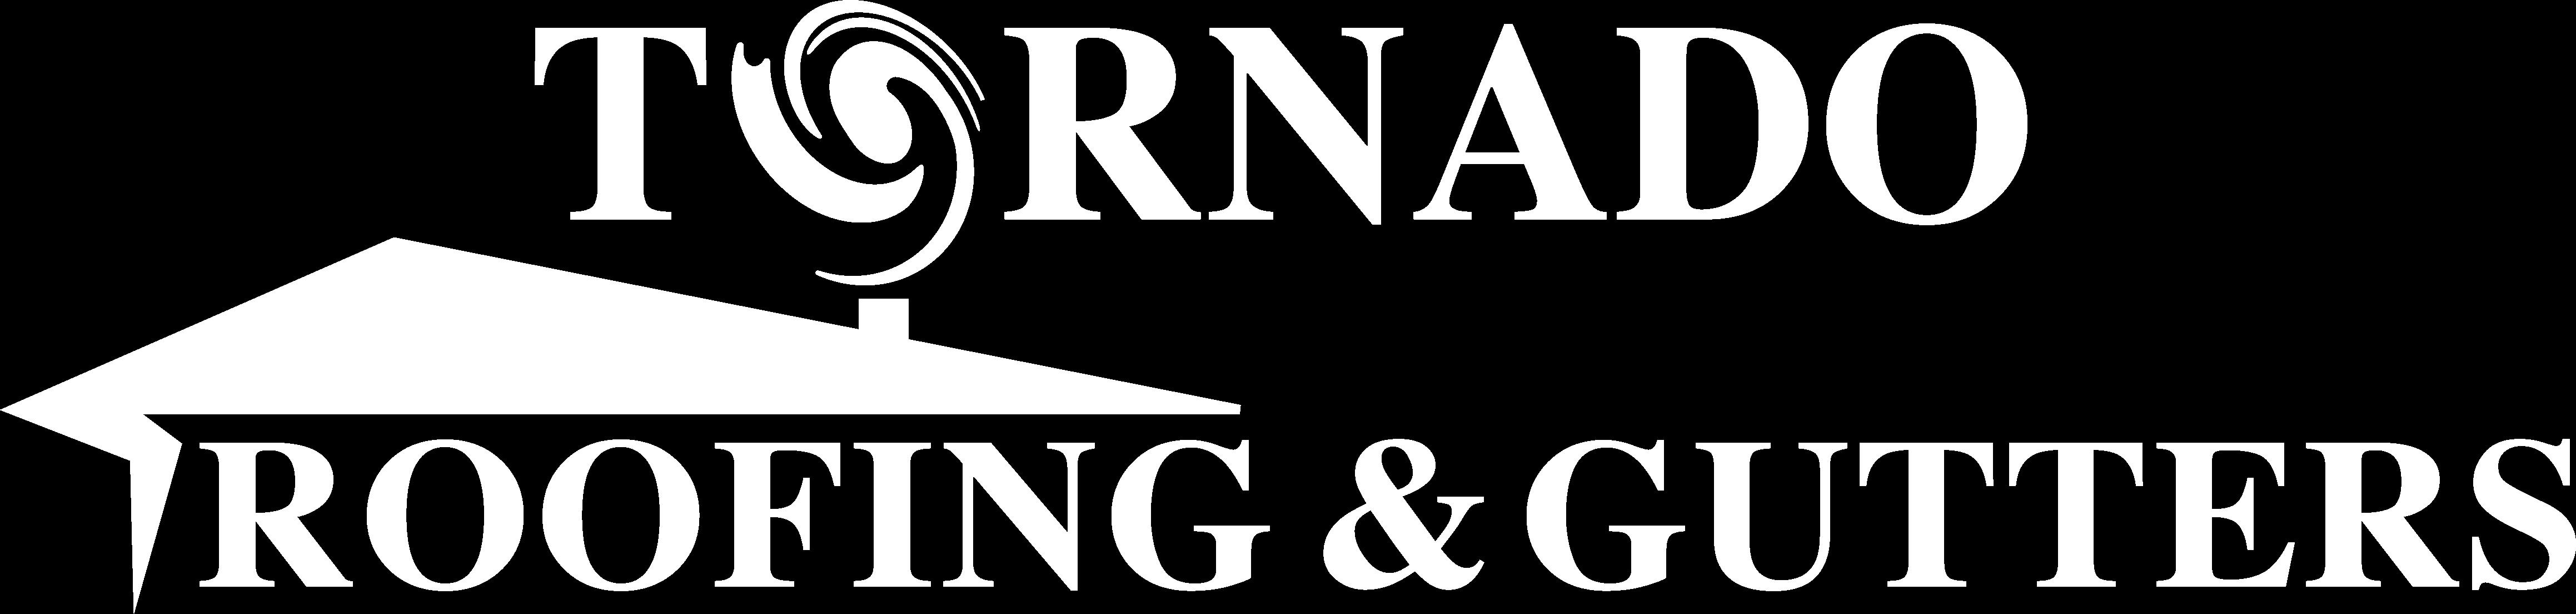 Roofing Contractor - Tornado Roofing & Gutters - Colorado